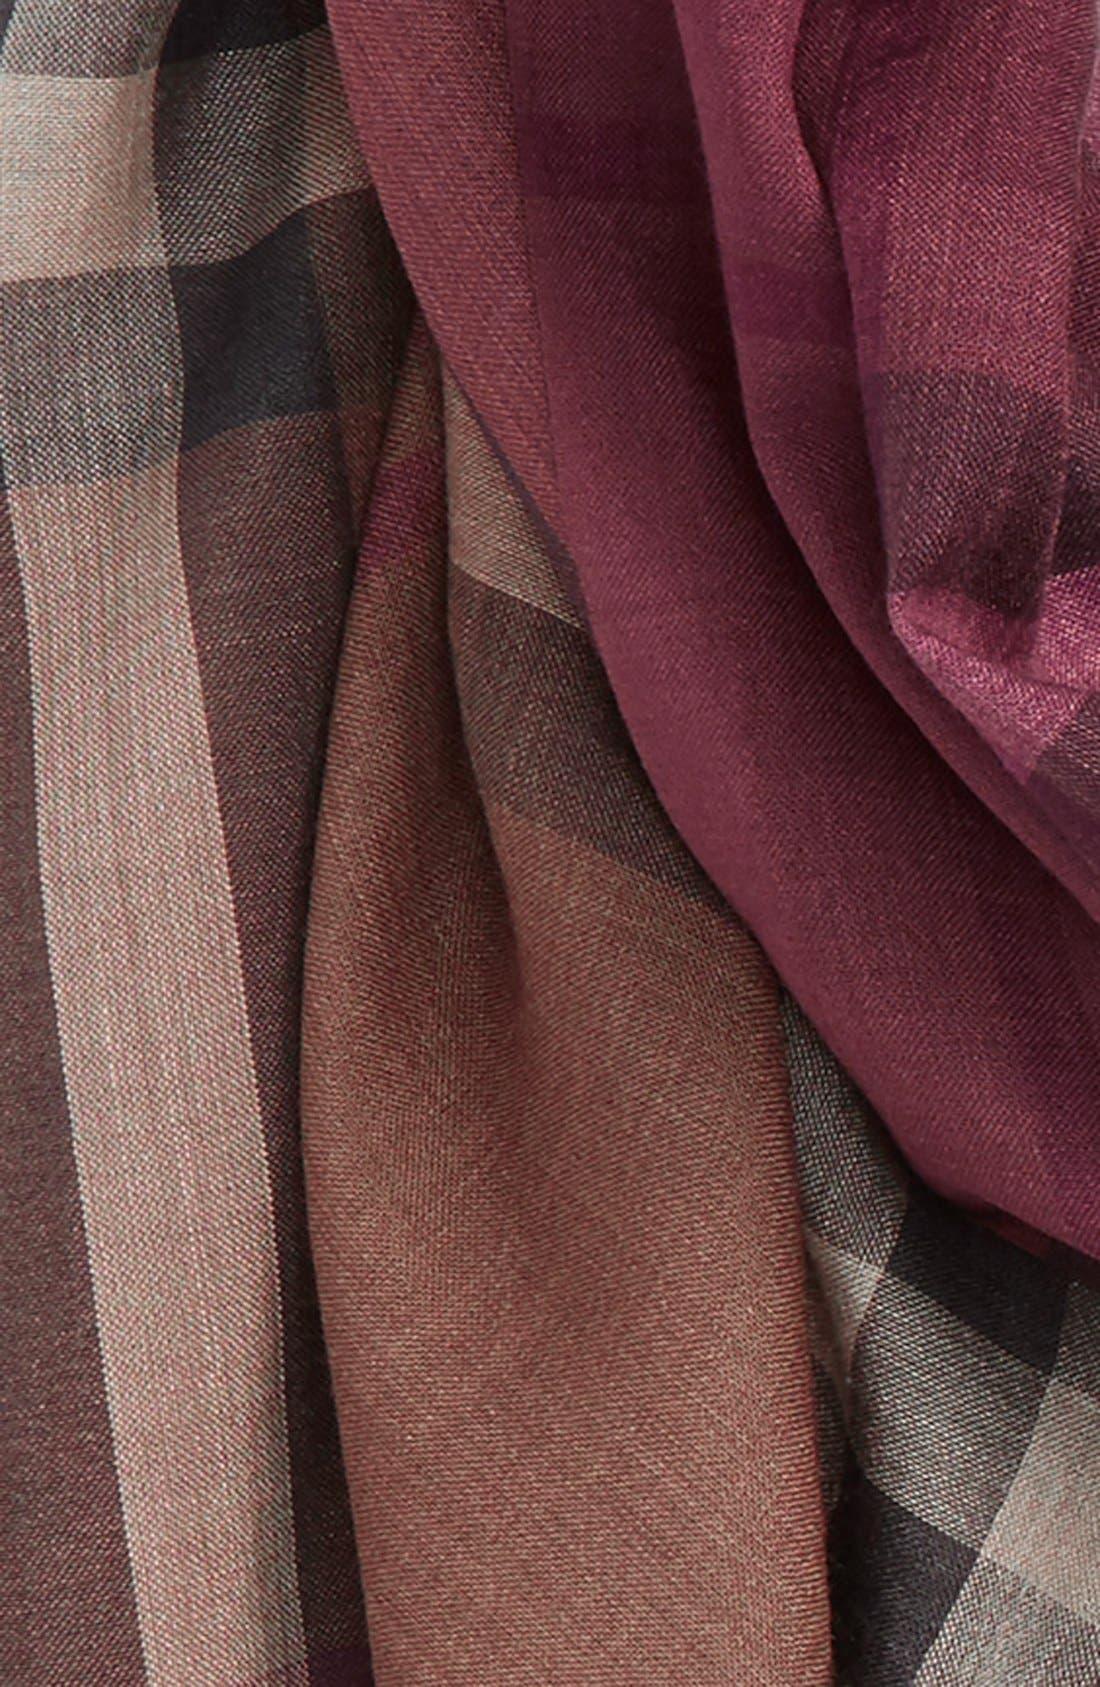 Ombré Check Wool & Silk Scarf,                             Alternate thumbnail 5, color,